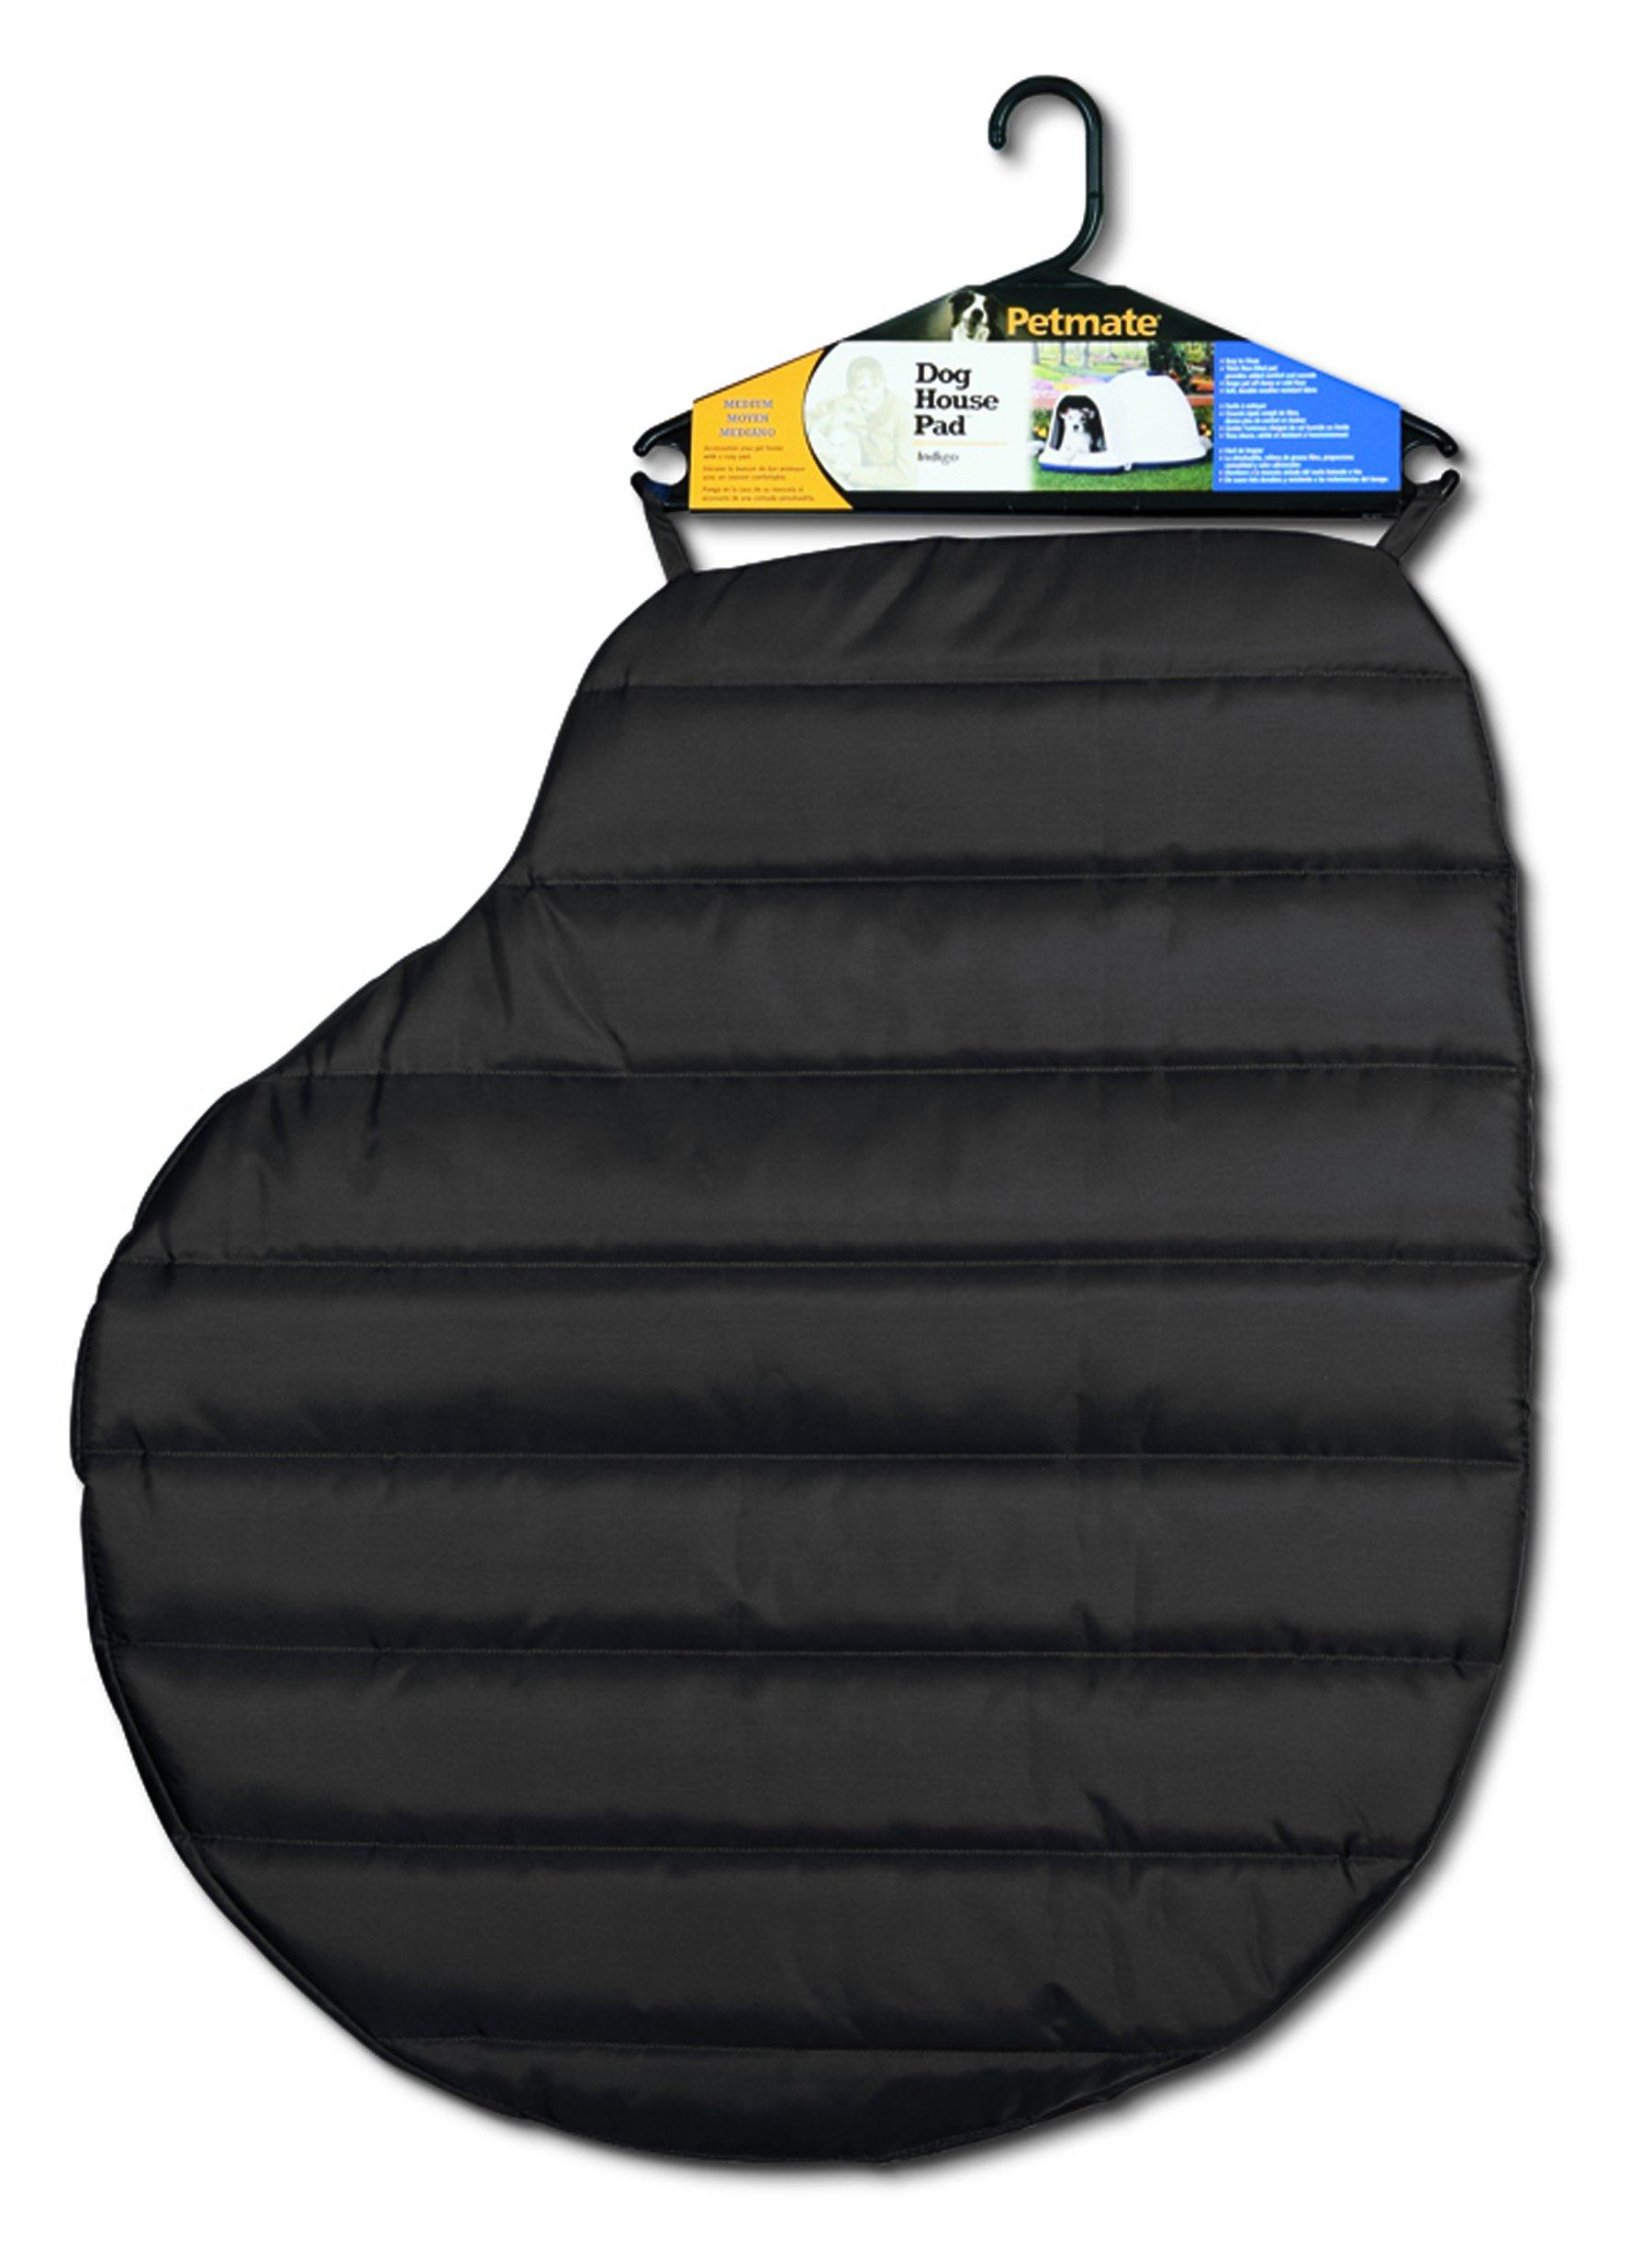 Petmate Quilted Indigo Nylon Pad, 50-90 lb, Black by Petmate